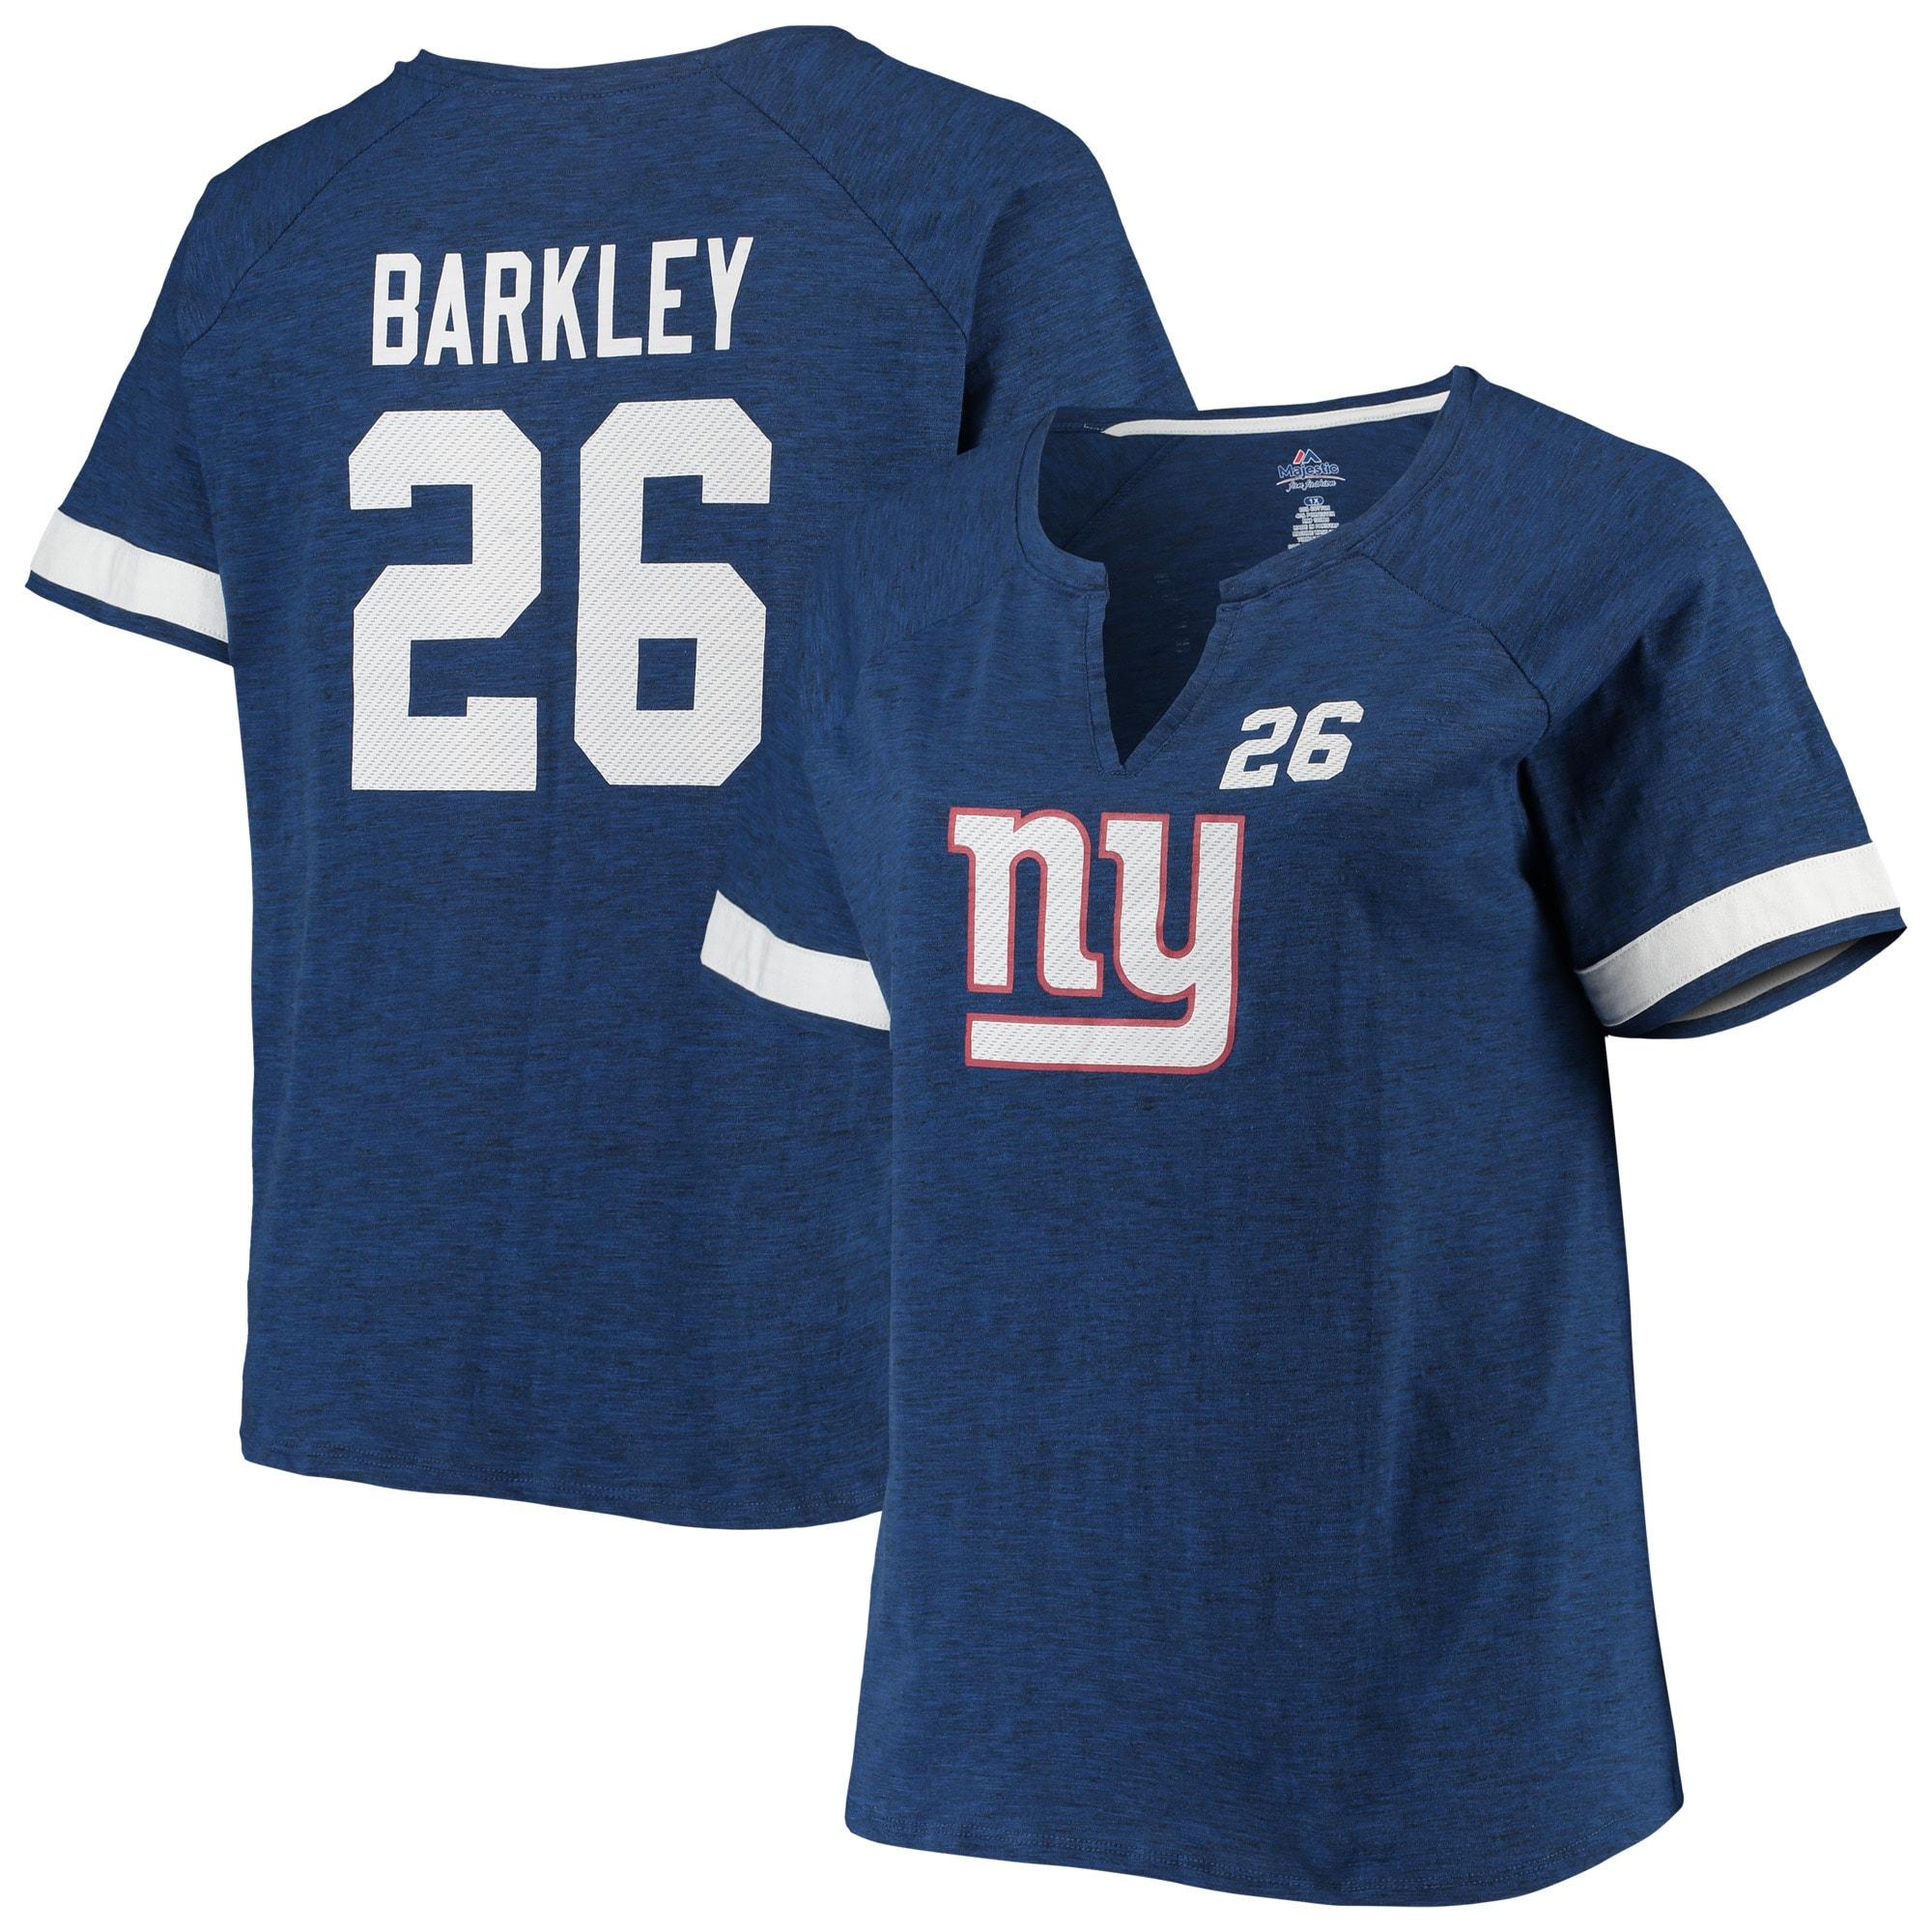 Saquon Barkley New York Giants Majestic Women's Plus Size Name & Number Notch Neck T-Shirt - Royal